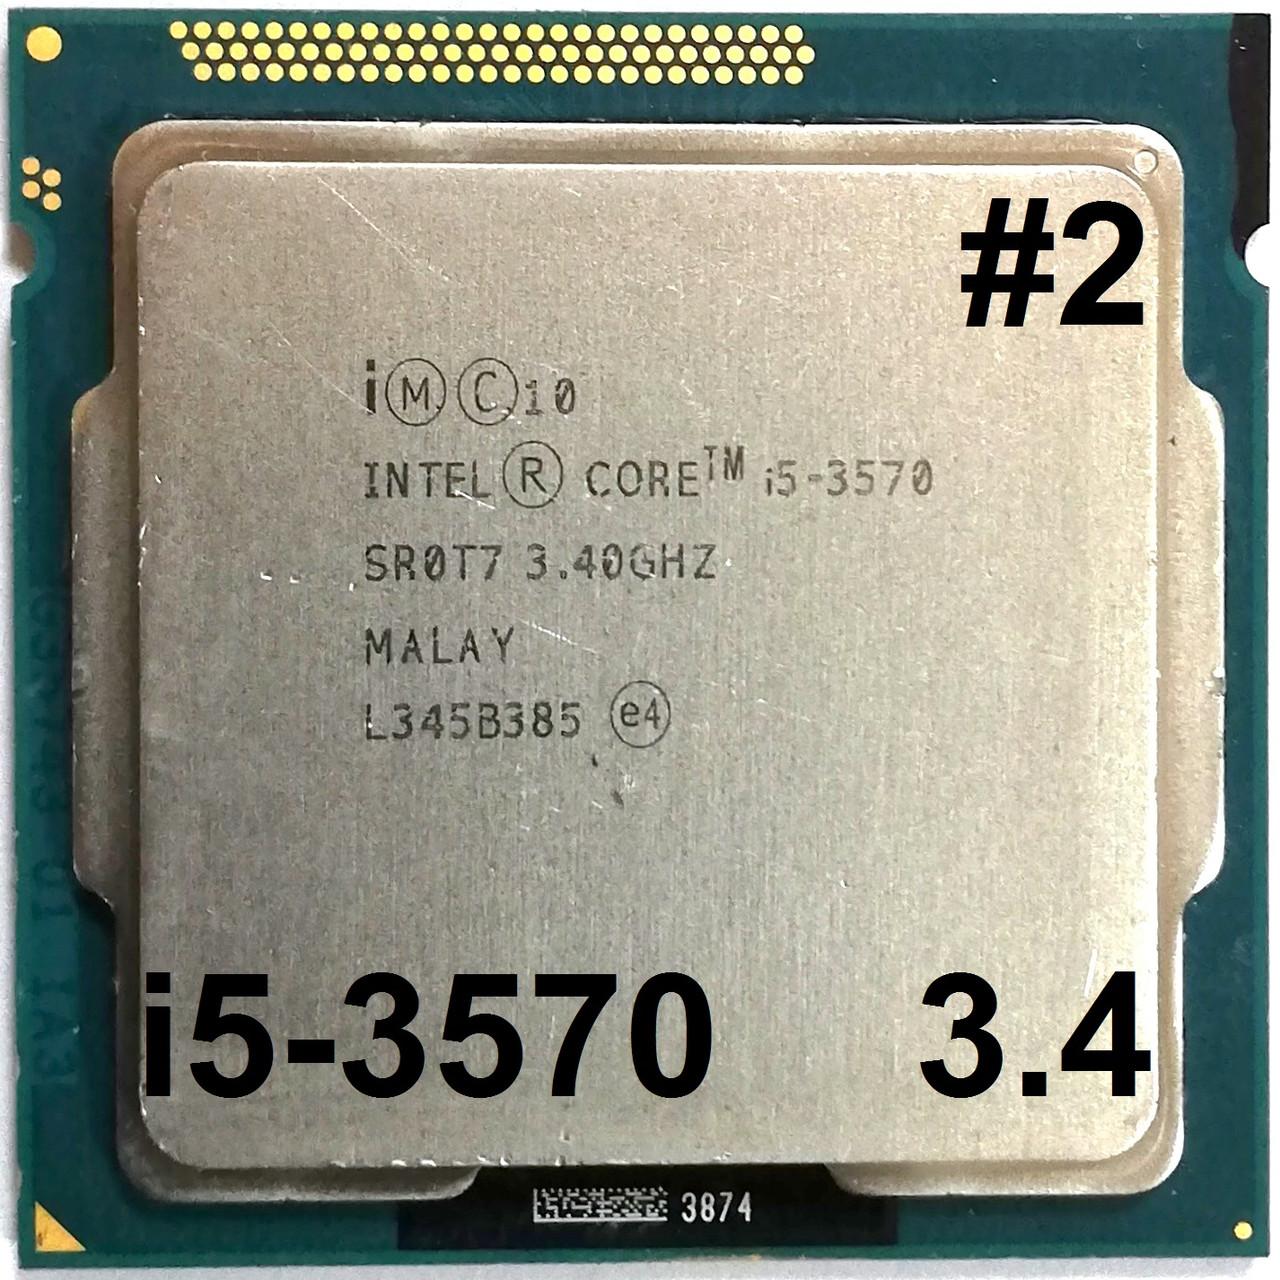 Процессор ЛОТ#2 Intel Core i5-3570 N0 SR0T7 3.4GHz 6M Cache Socket 1155 Б/У